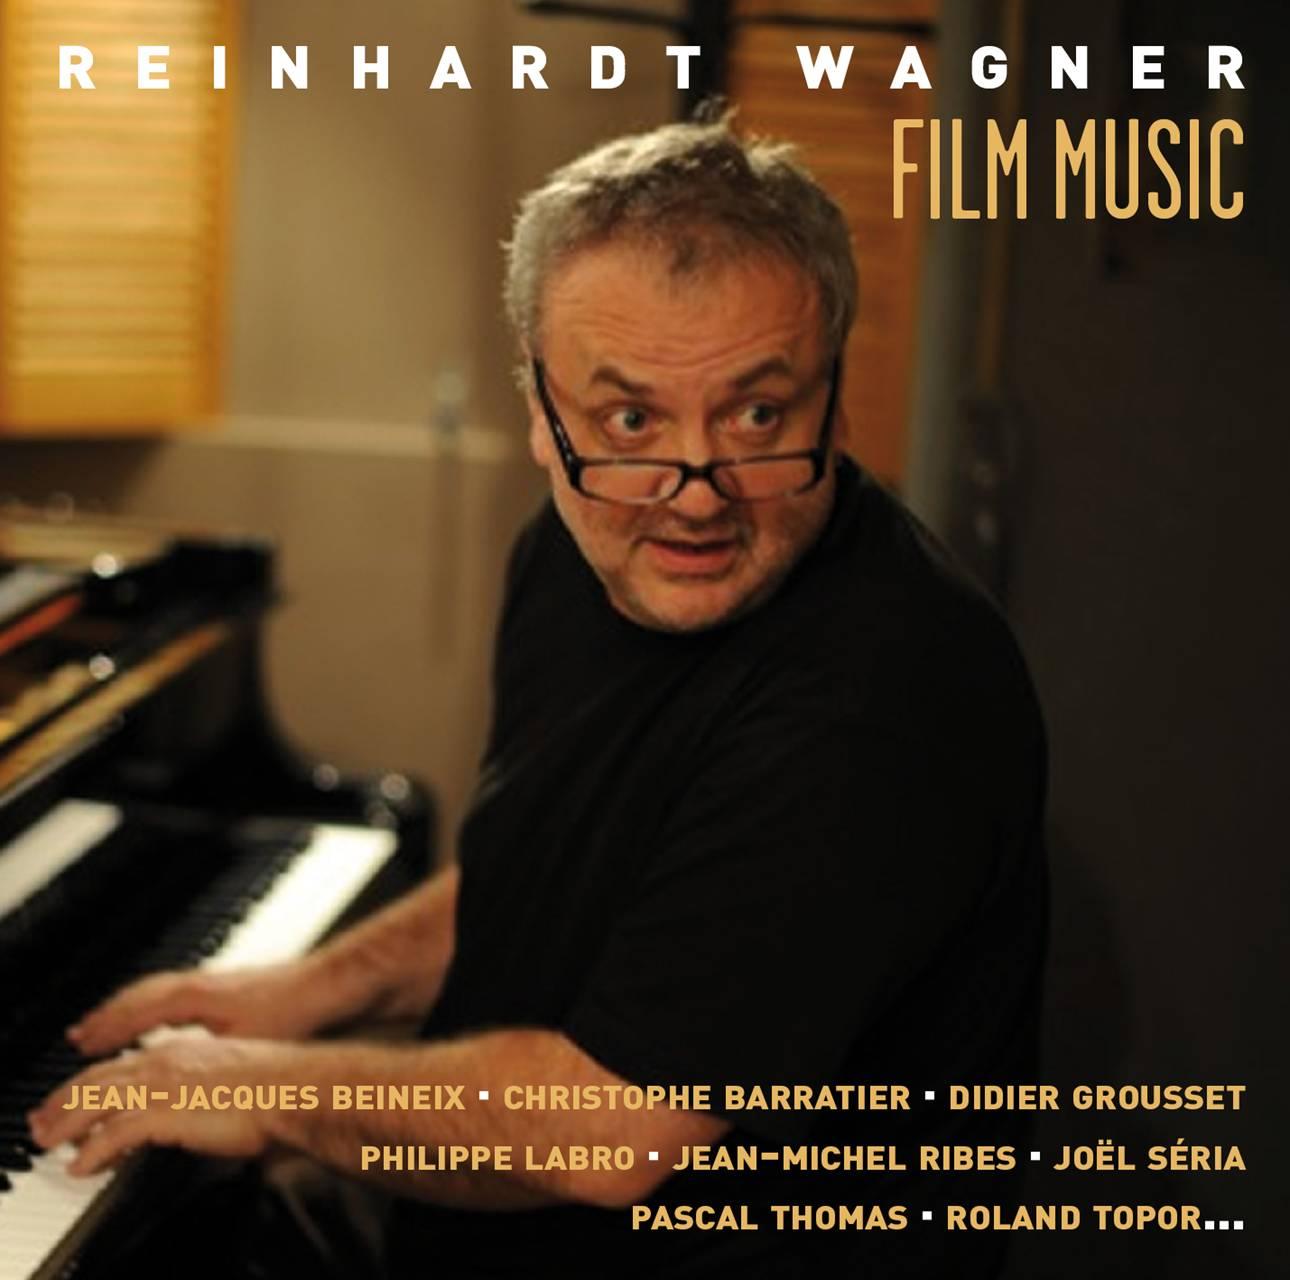 Reinhardt Wagner - Film Music